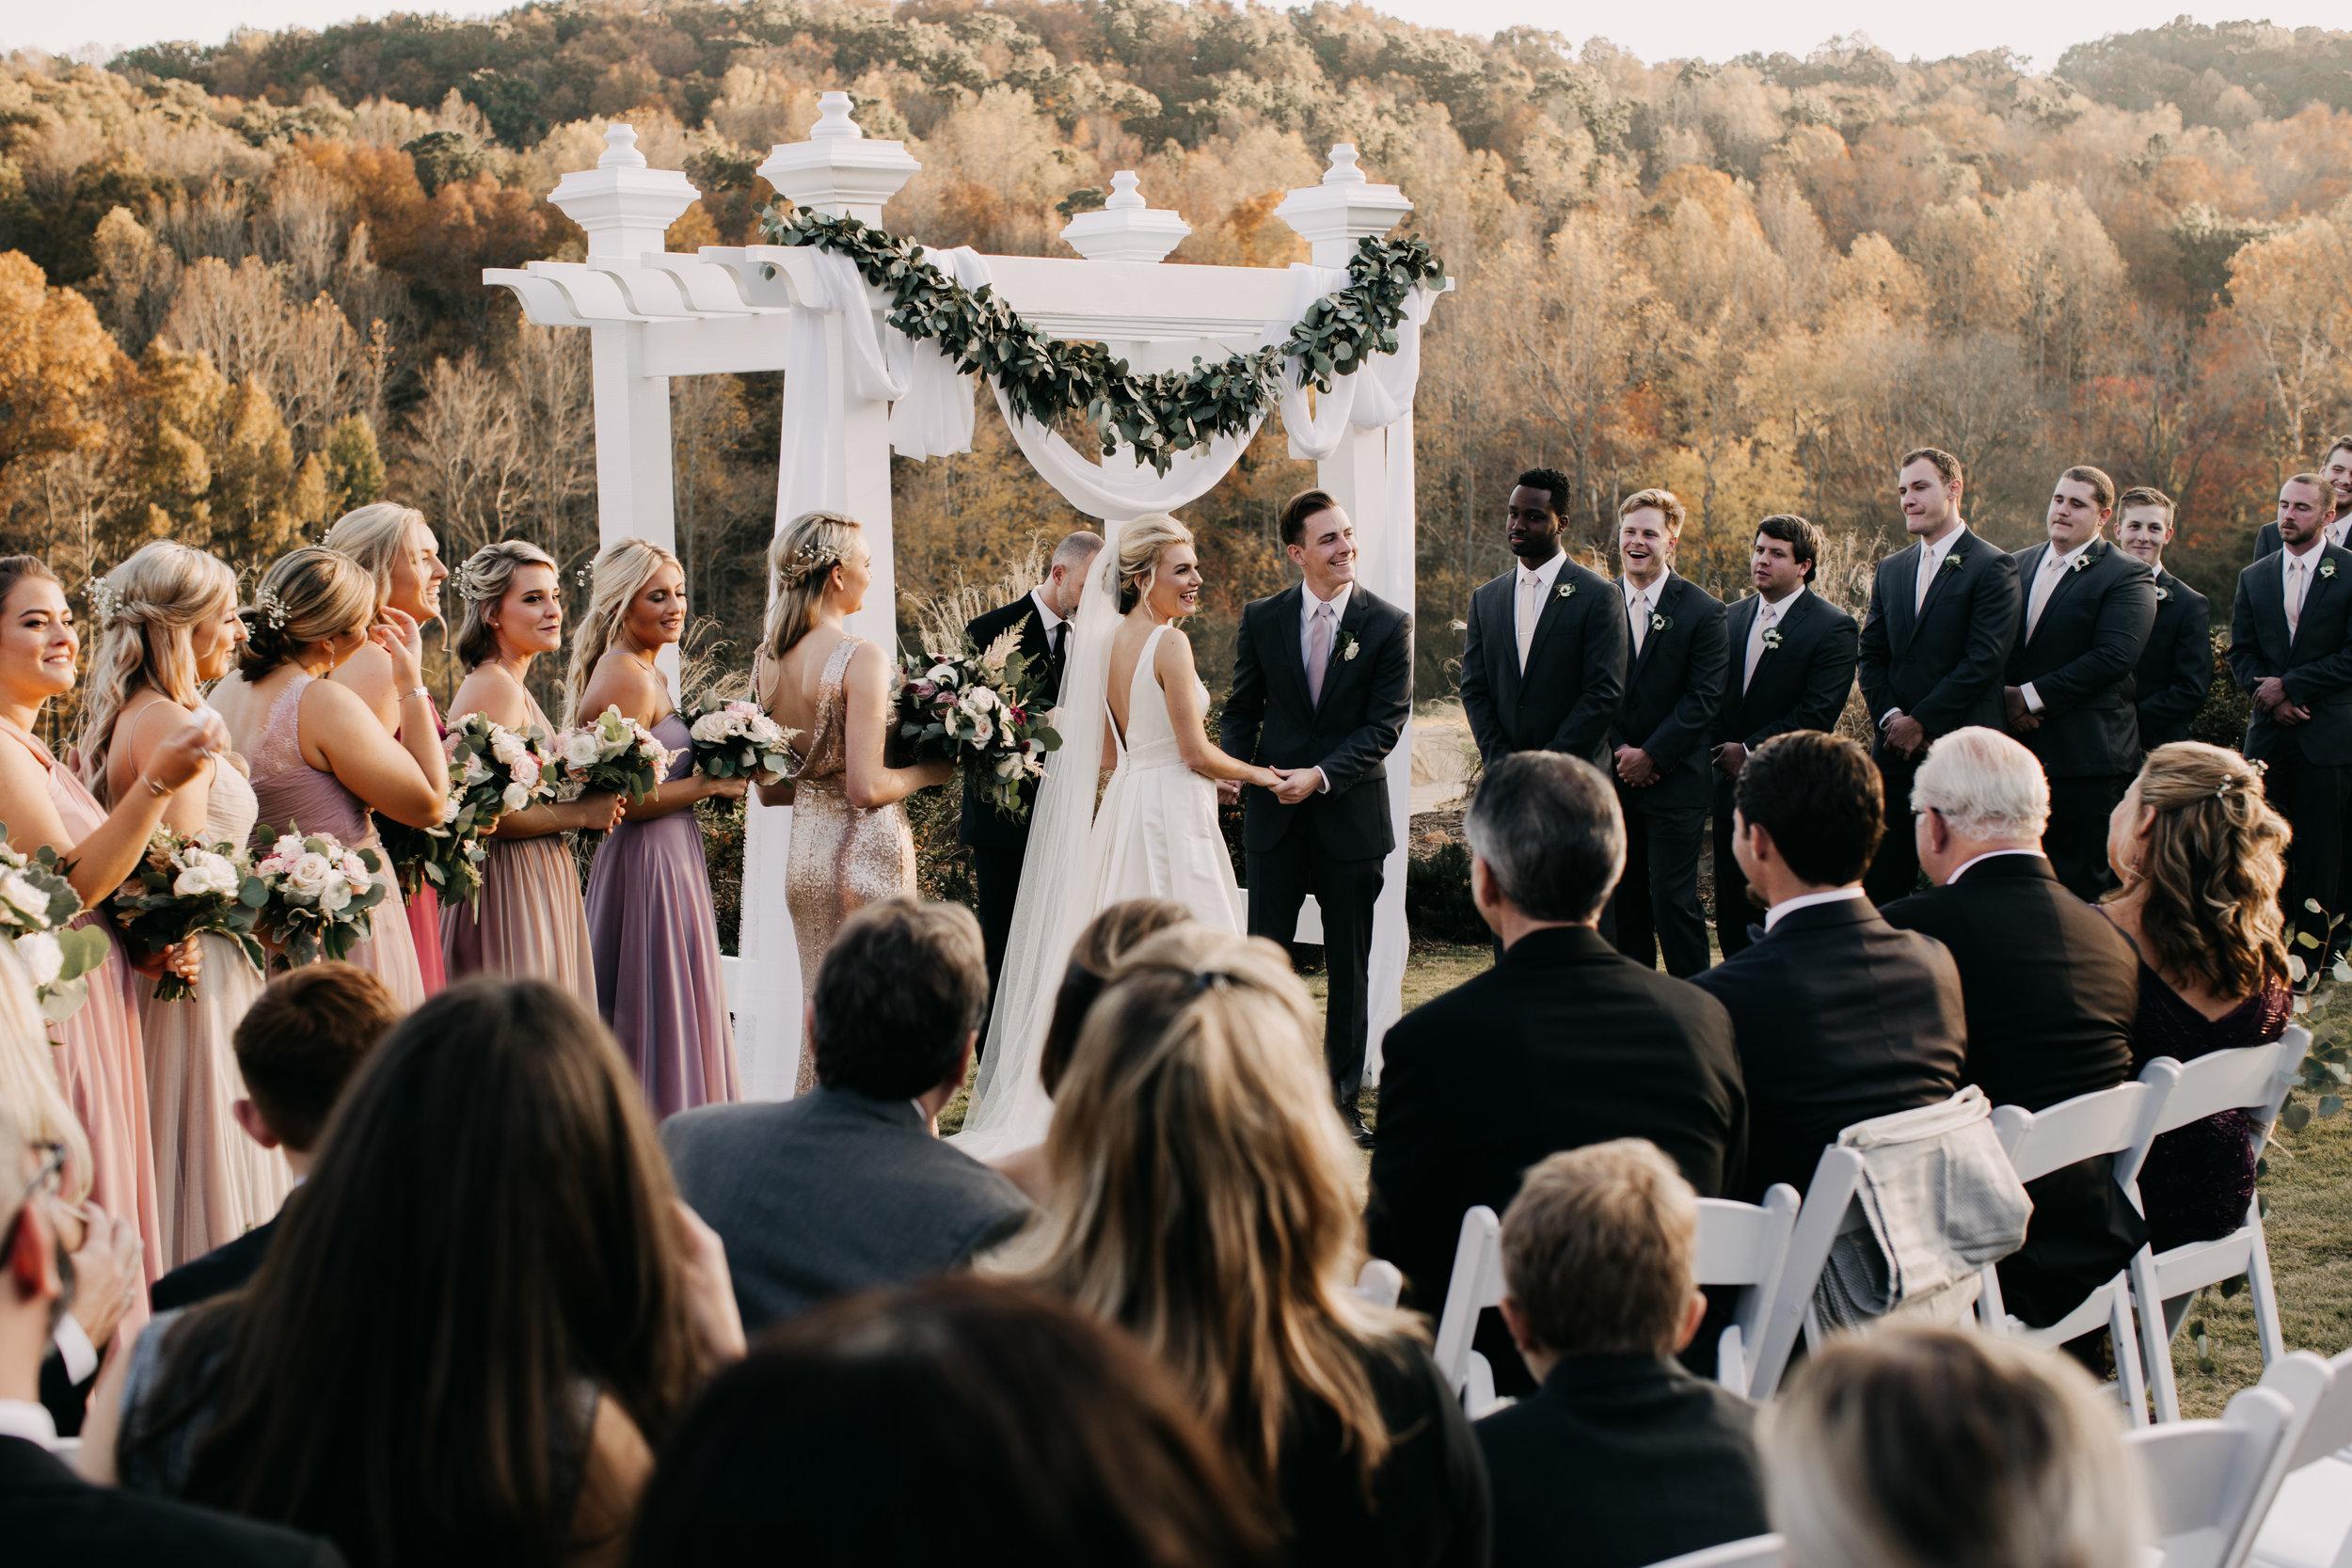 Kaylyn & Ryan Final Wedding Photos352.jpg